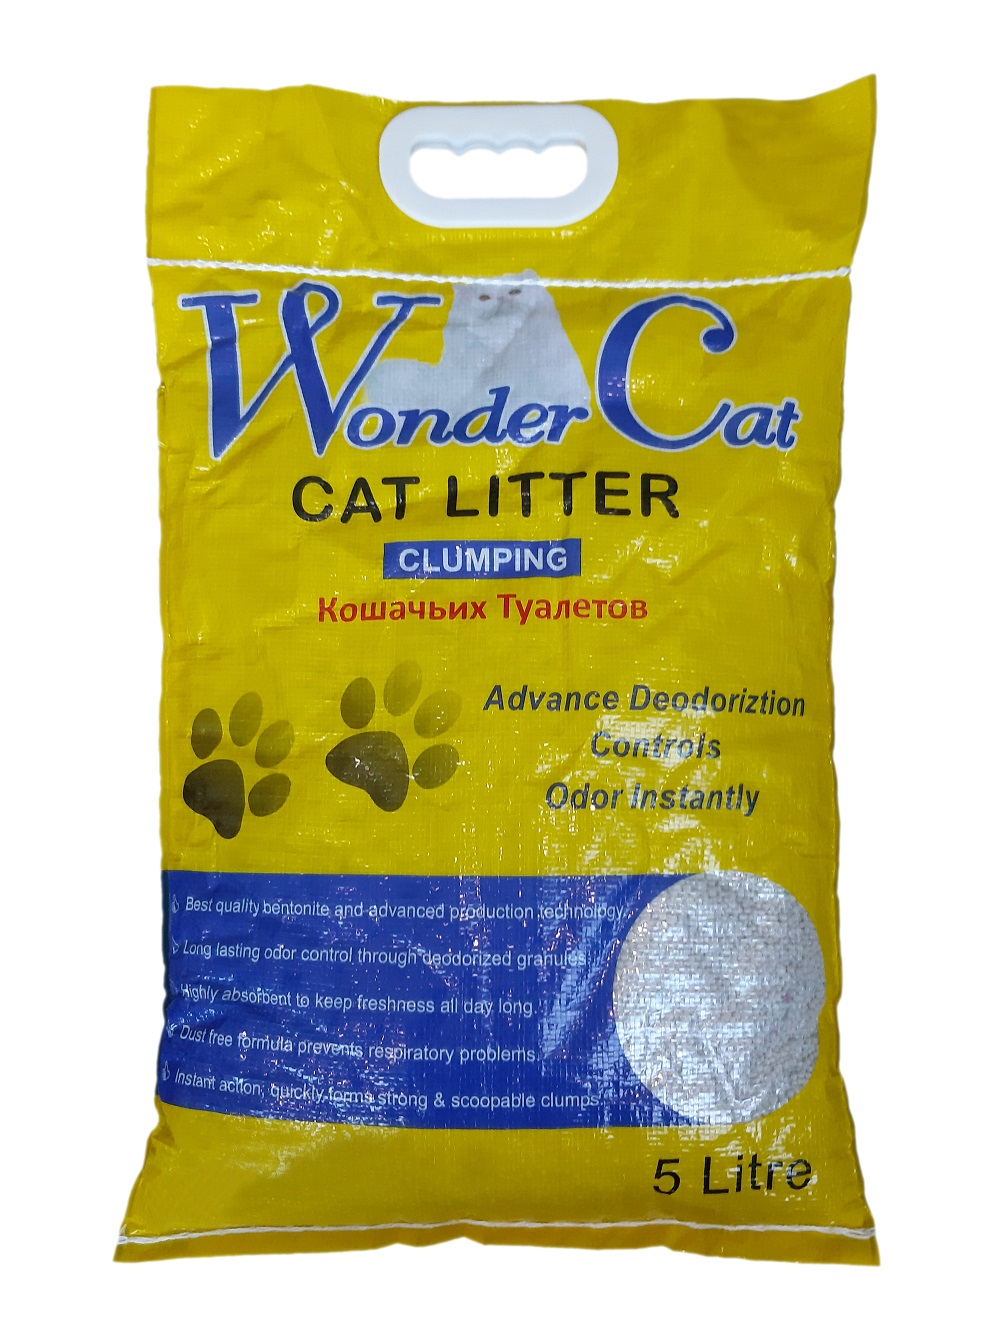 Wonder Cat Litter Deodorized No Scent - 5Litre - Pet Accessories - Pet Store - Pet supplies